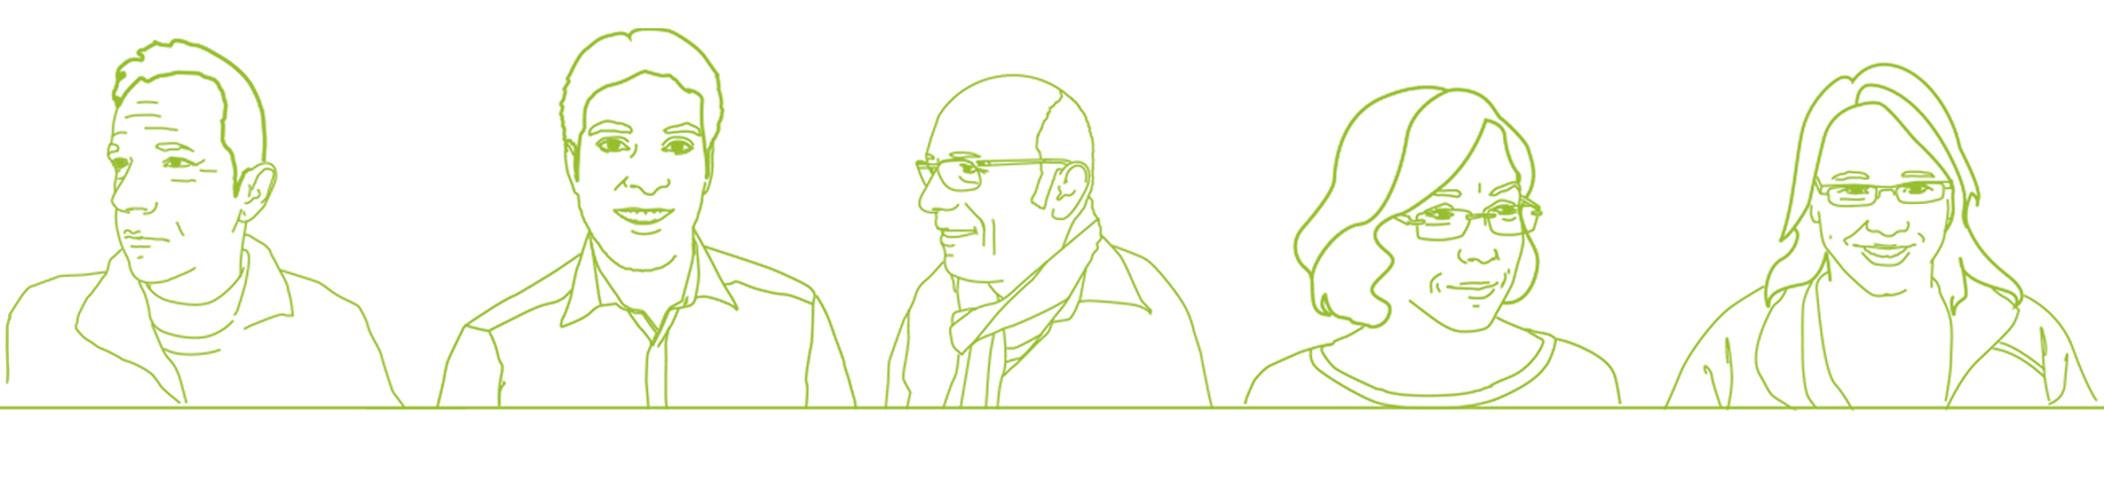 illustrationen_iconsets_may_biopower_teamlemke_werbeagentur